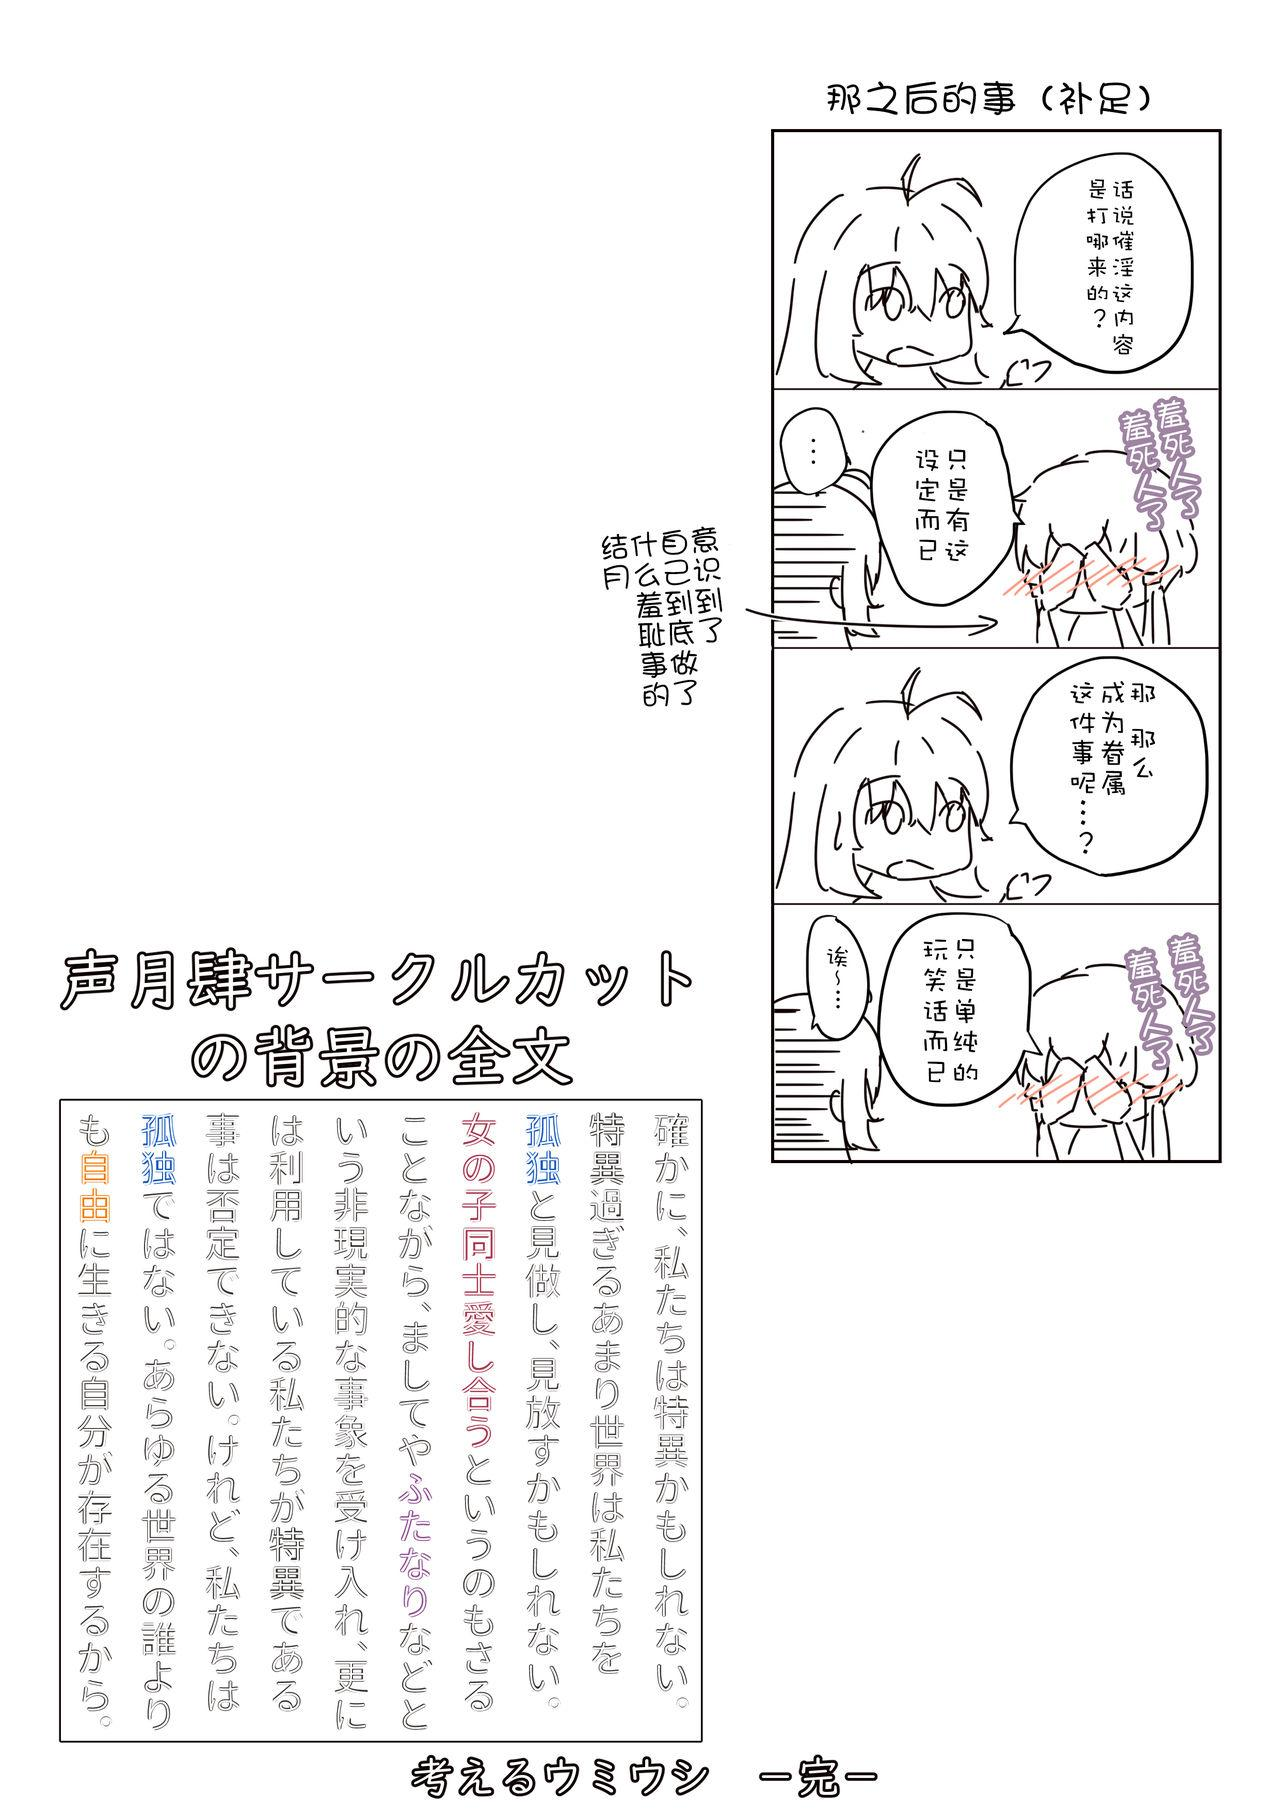 Kangaeru Umiushi 15